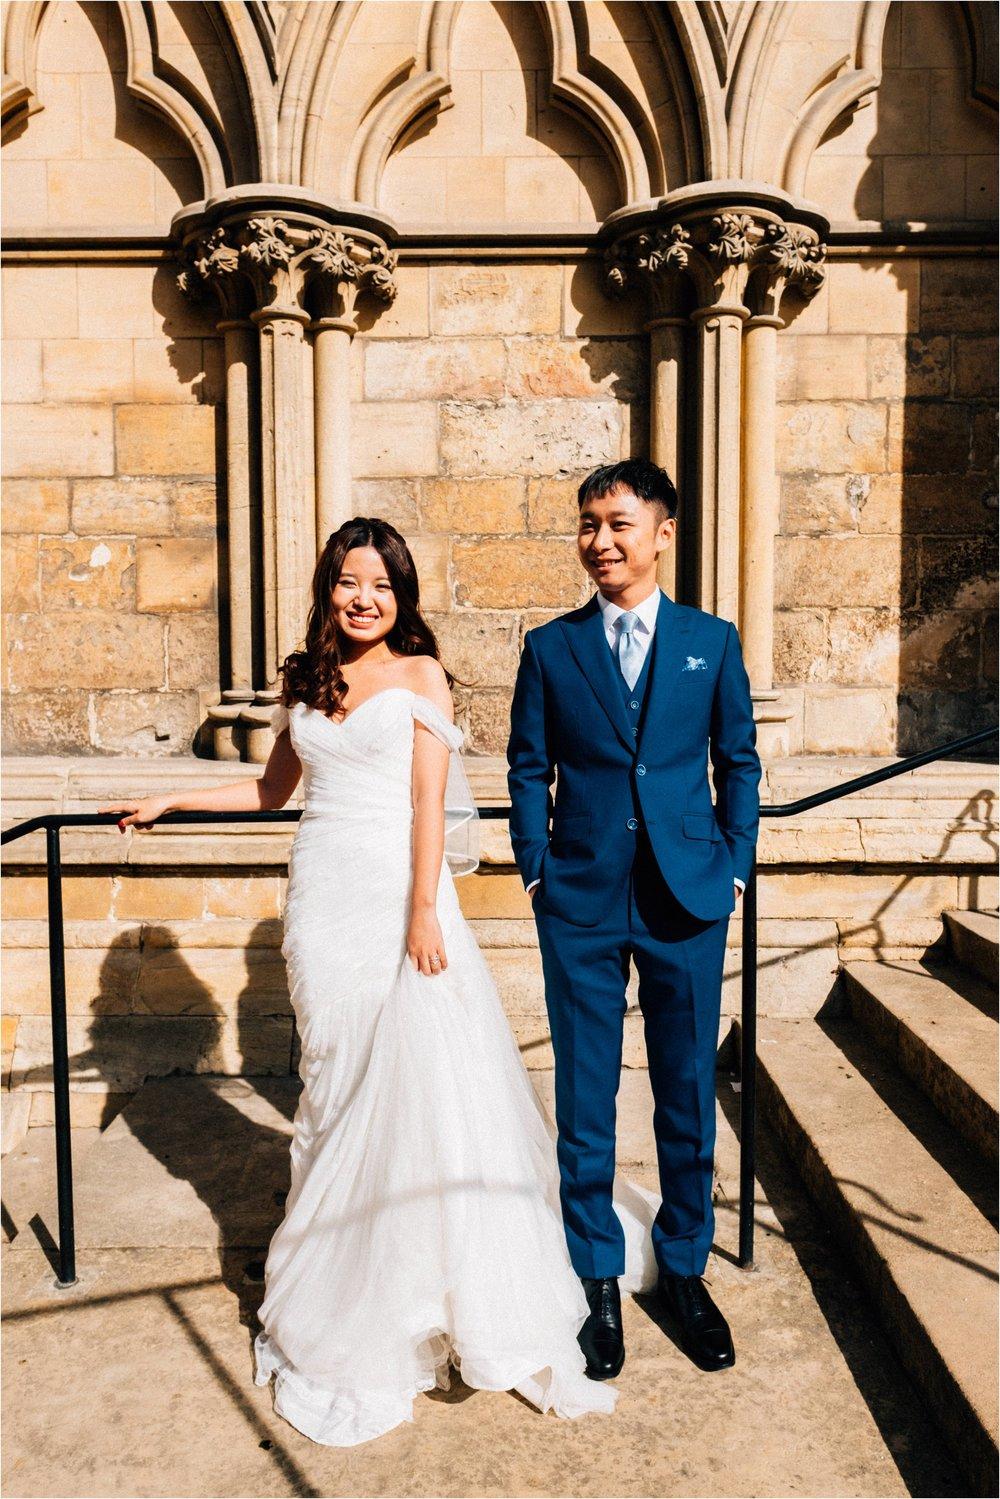 York city elopement wedding photographer_0115.jpg